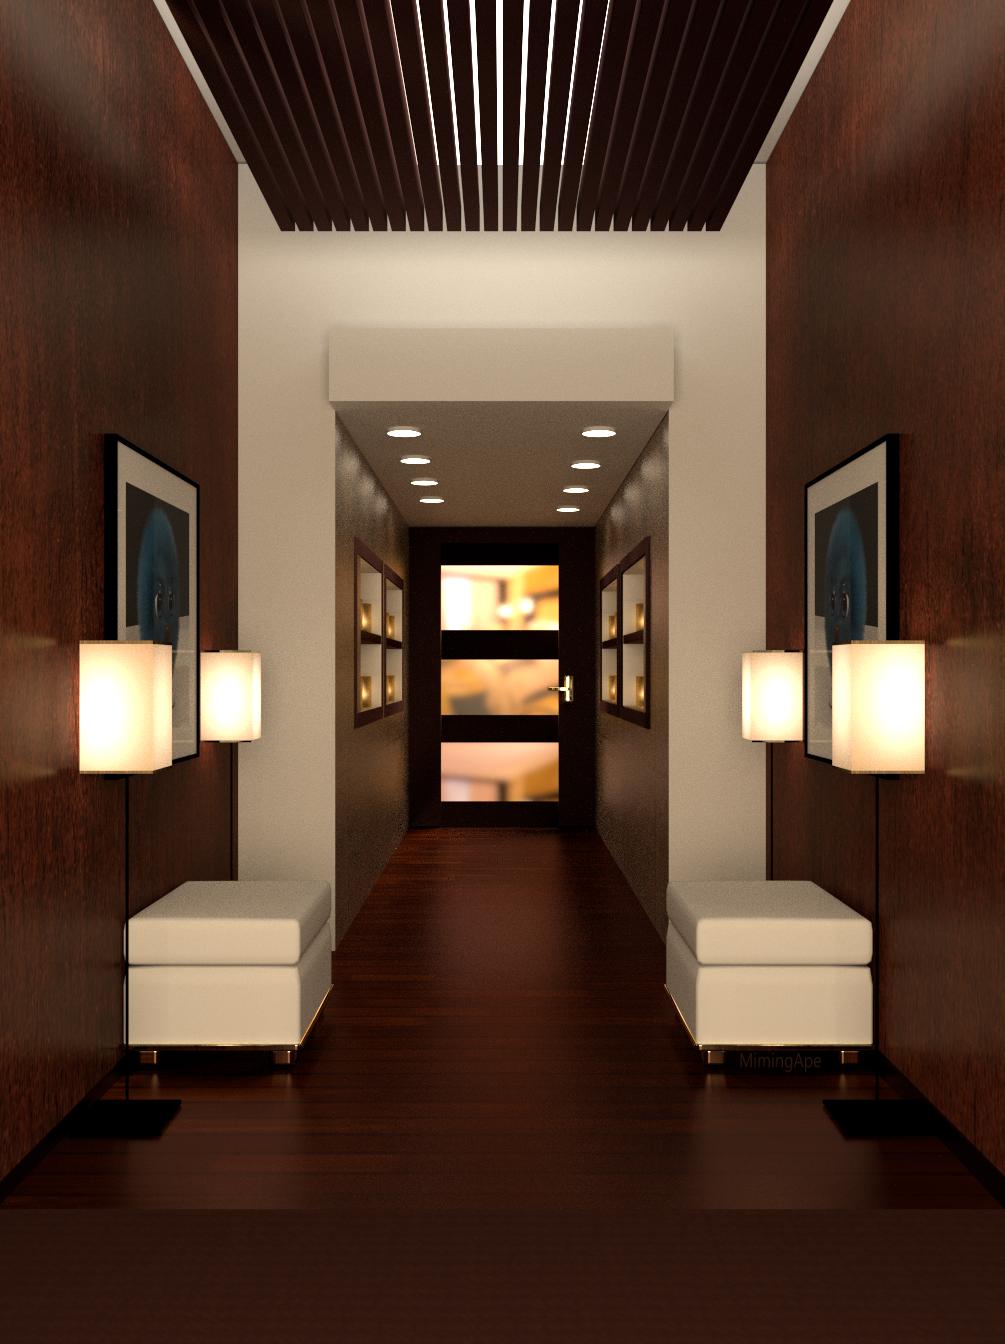 Hallway lighting modern  The hallways in a modern style  The Hallways In A Modern Style